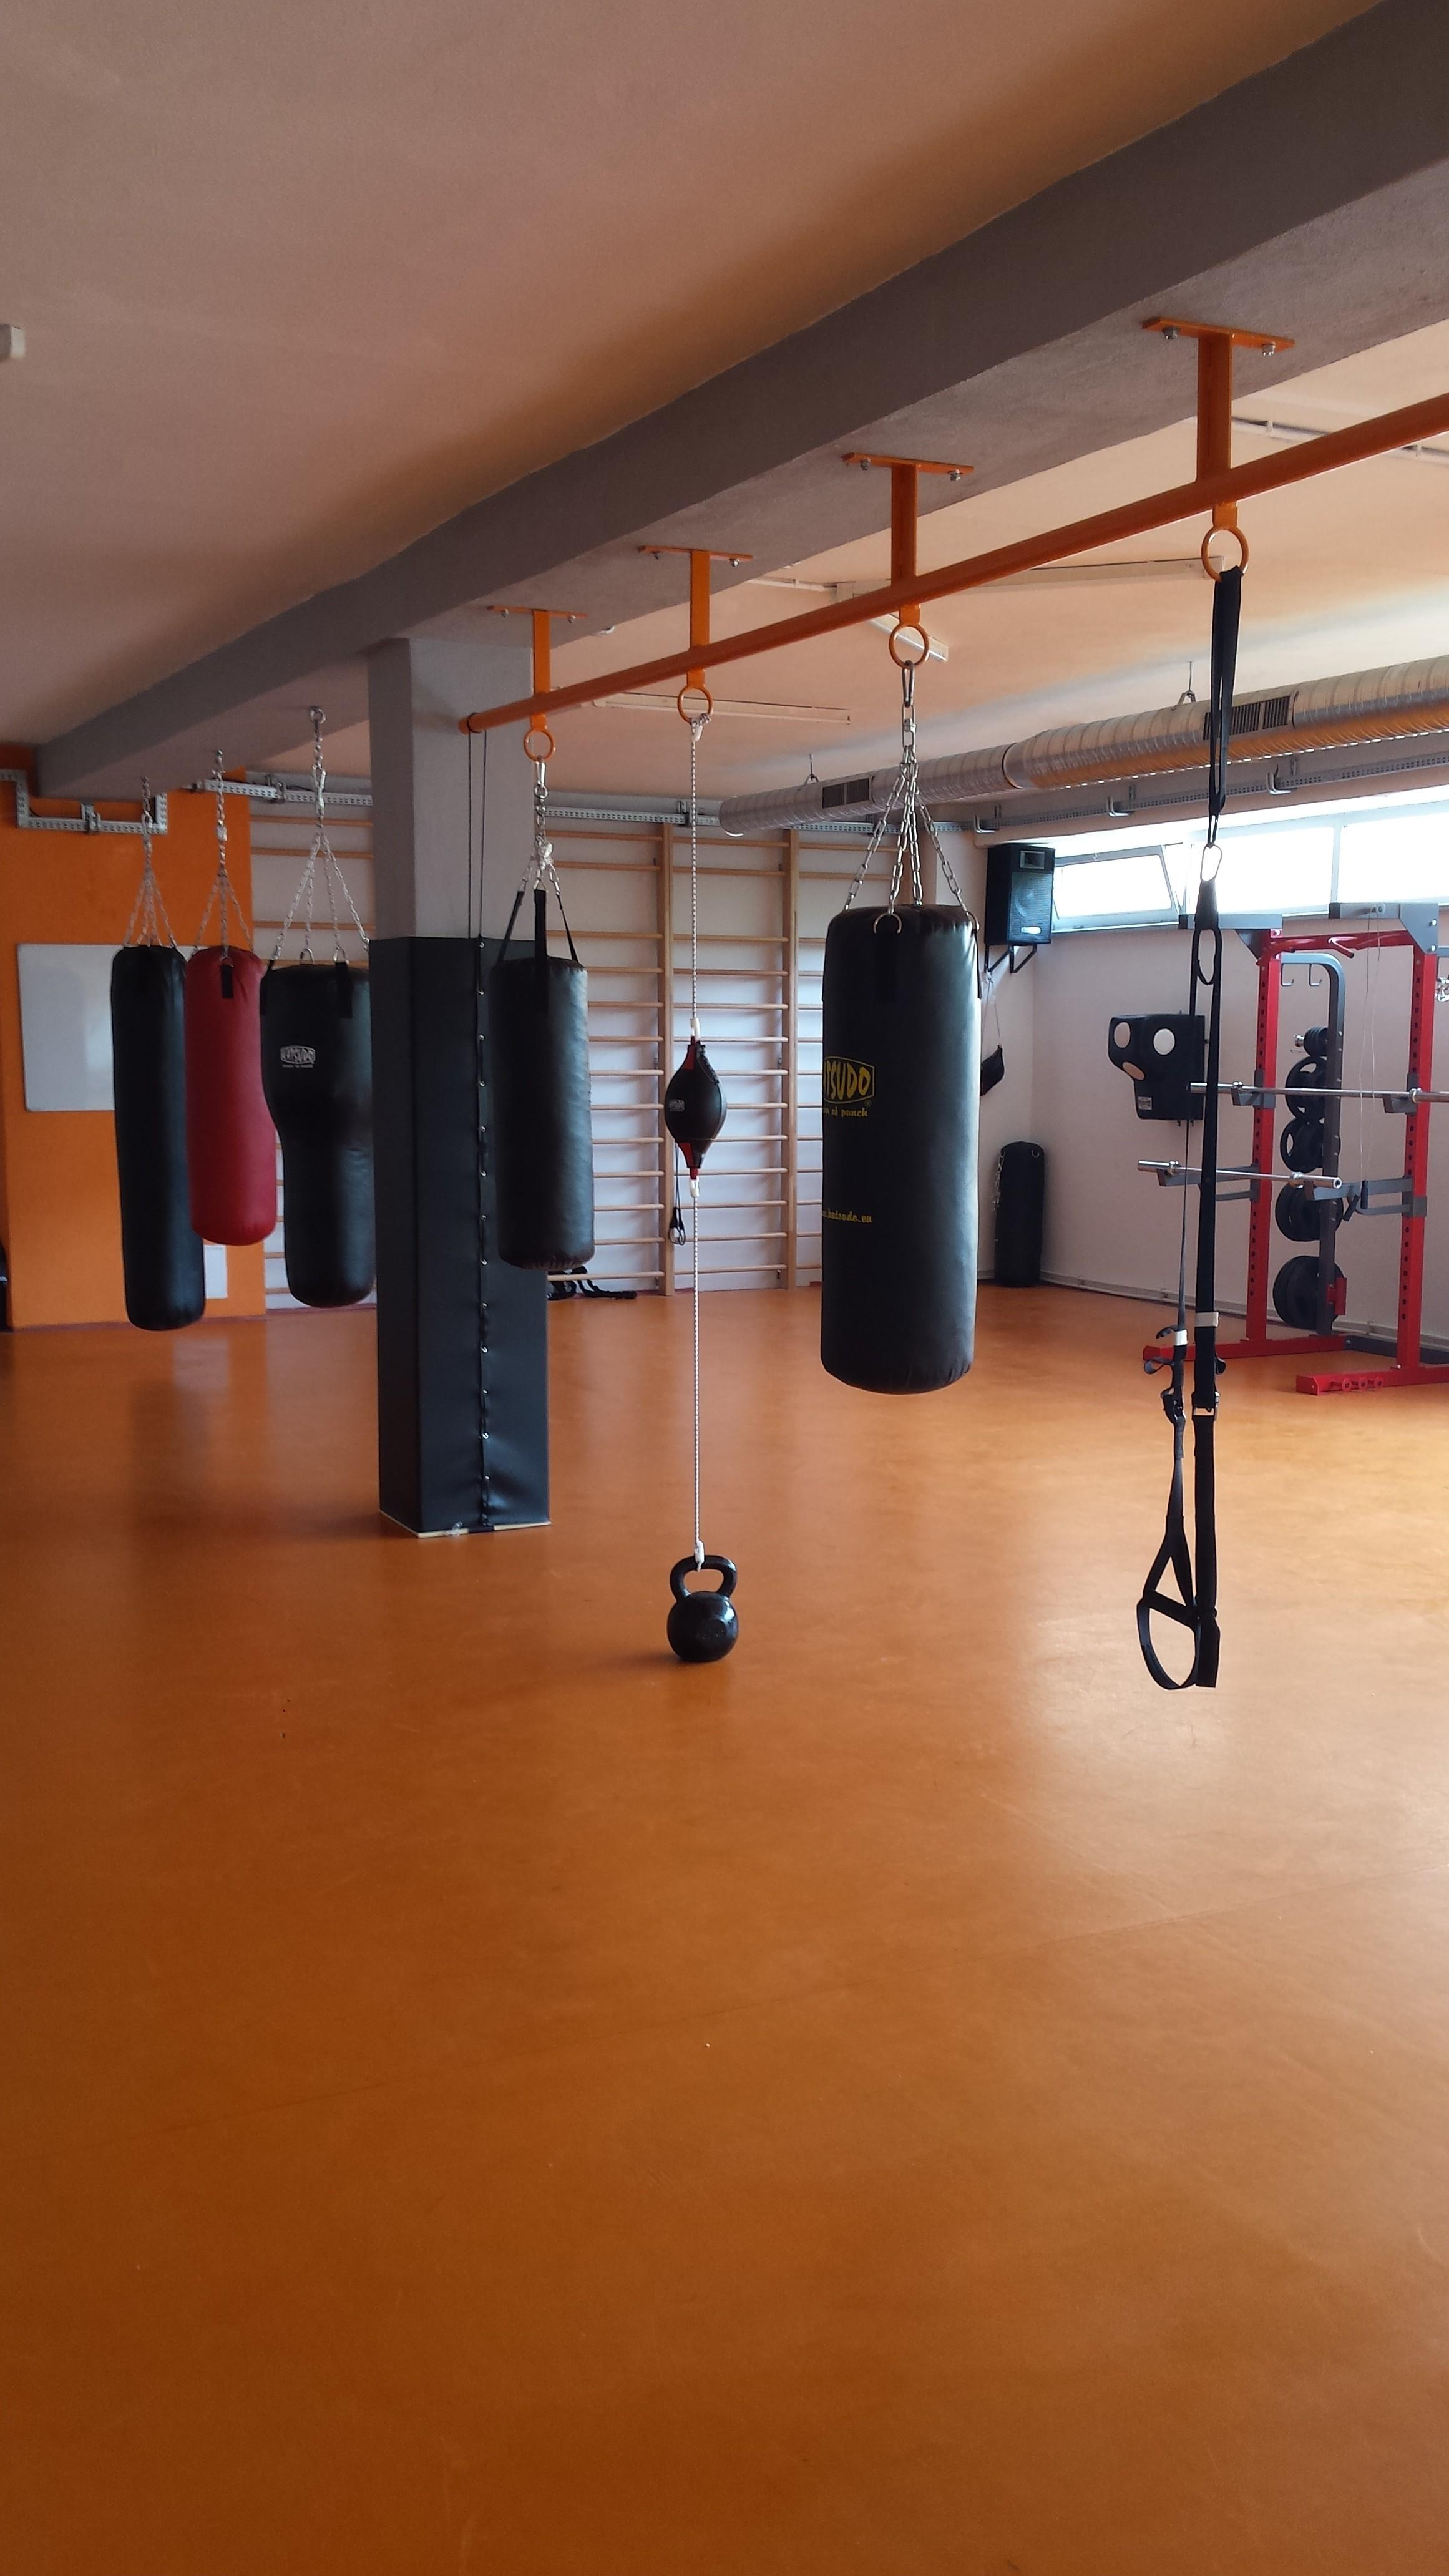 funkčná hala impulz fitness club topoľčany